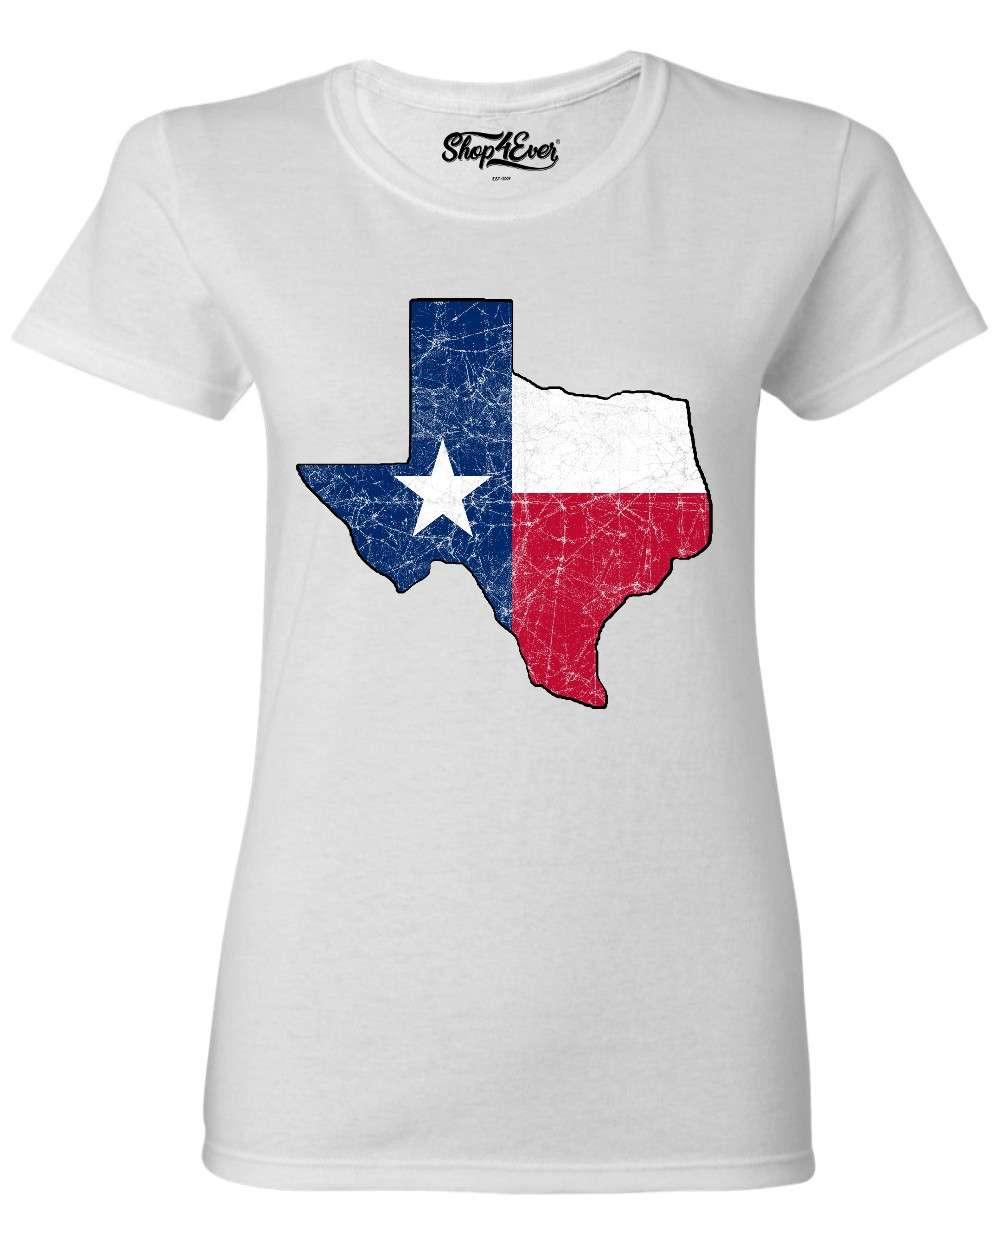 Distressed-Texas-Map-Women-039-s-T-Shirt-Country-Southern-Texan-Souvenir-Shirts thumbnail 20